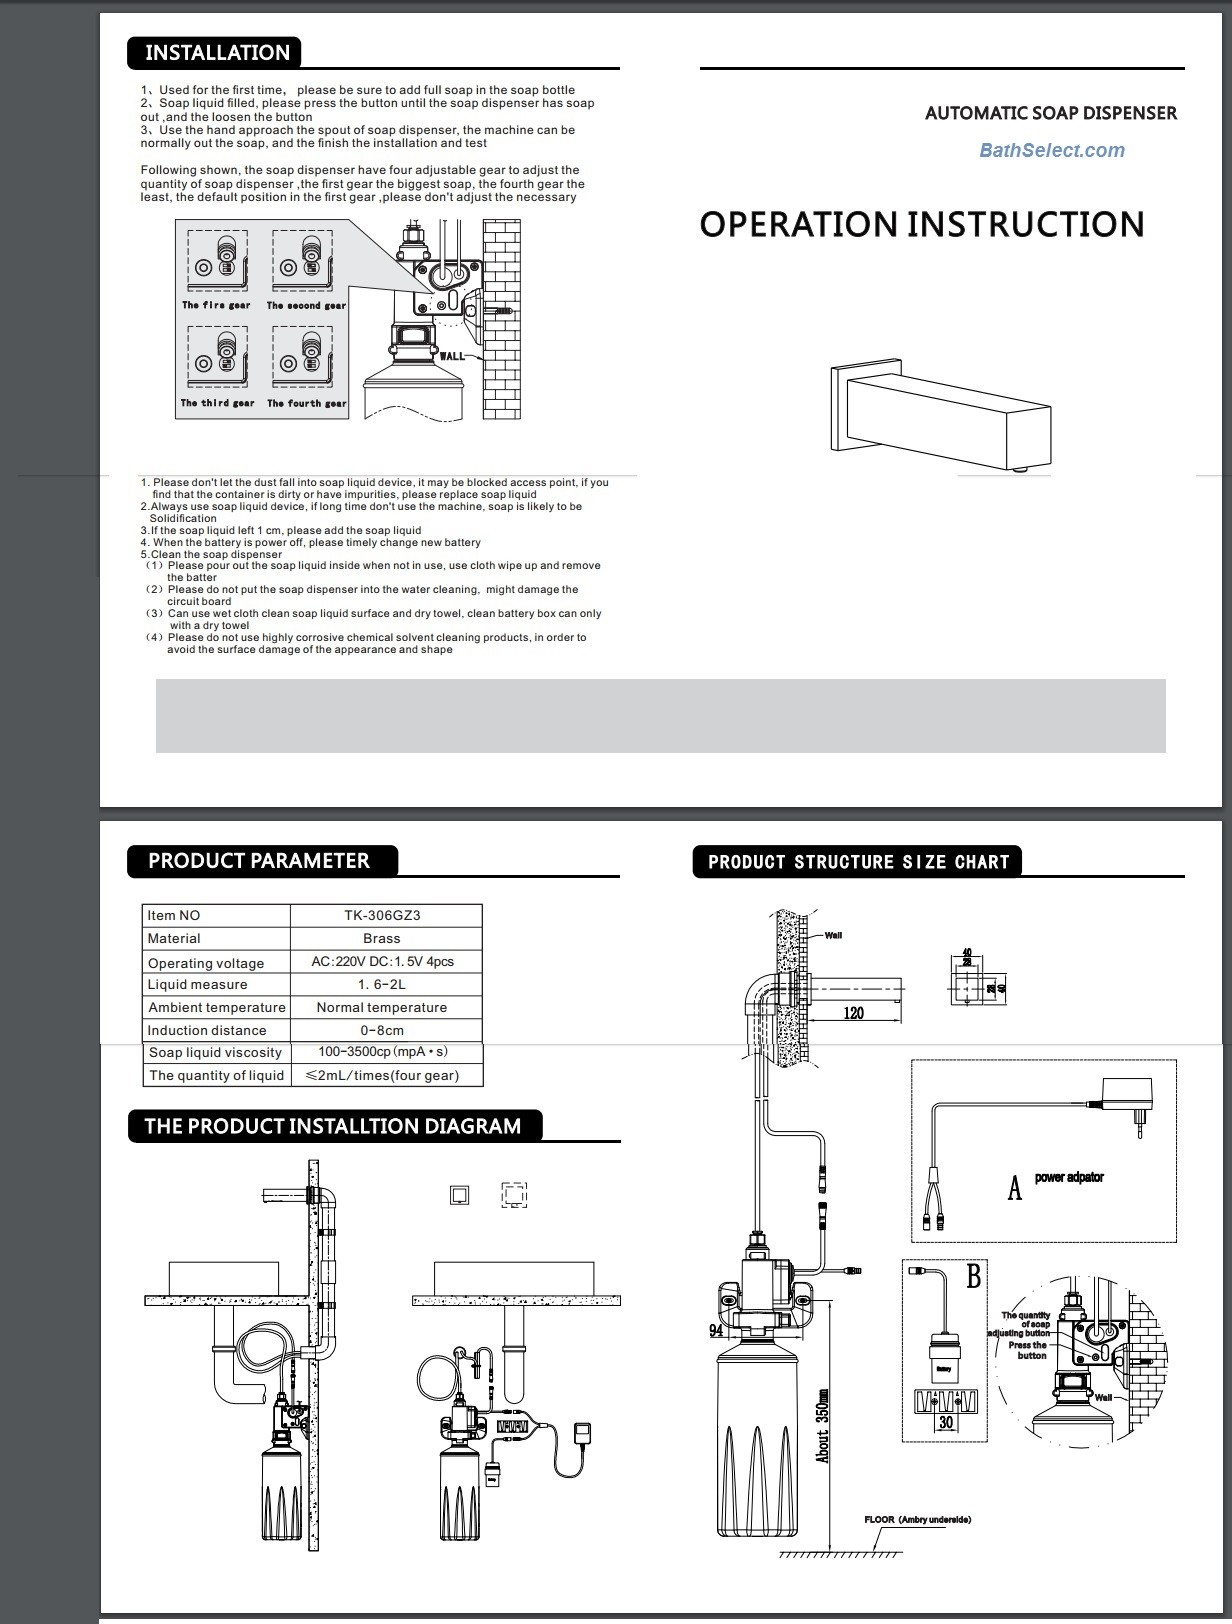 Kib M2401 Installation Manual Installation Instructions for Wall Mounted Bath Sensor Faucet Of Kib M2401 Installation Manual